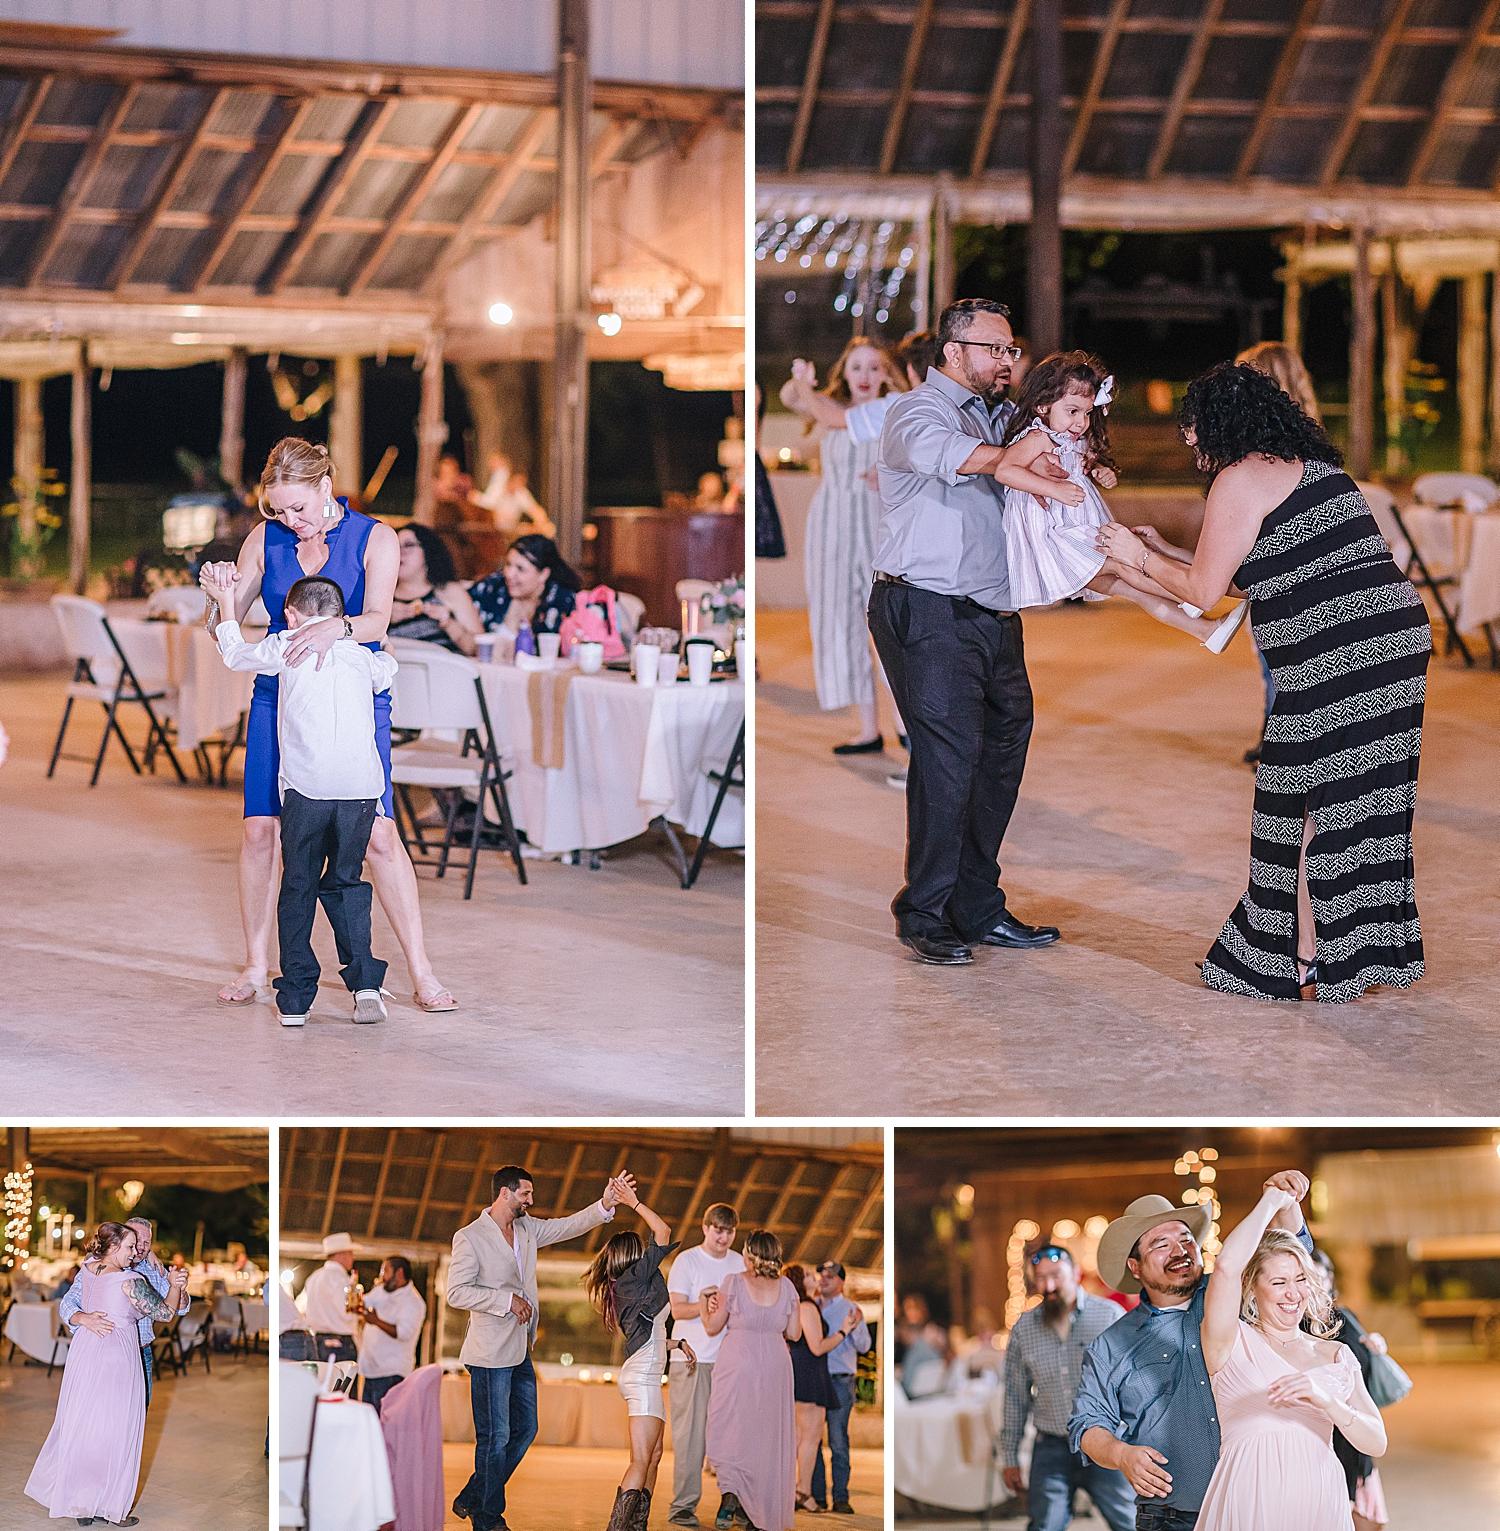 Rio-Cibilo-Ranch-Marion-Texas-Wedding-Rustic-Blush-Rose-Quartz-Details-Carly-Barton-Photography_0104.jpg